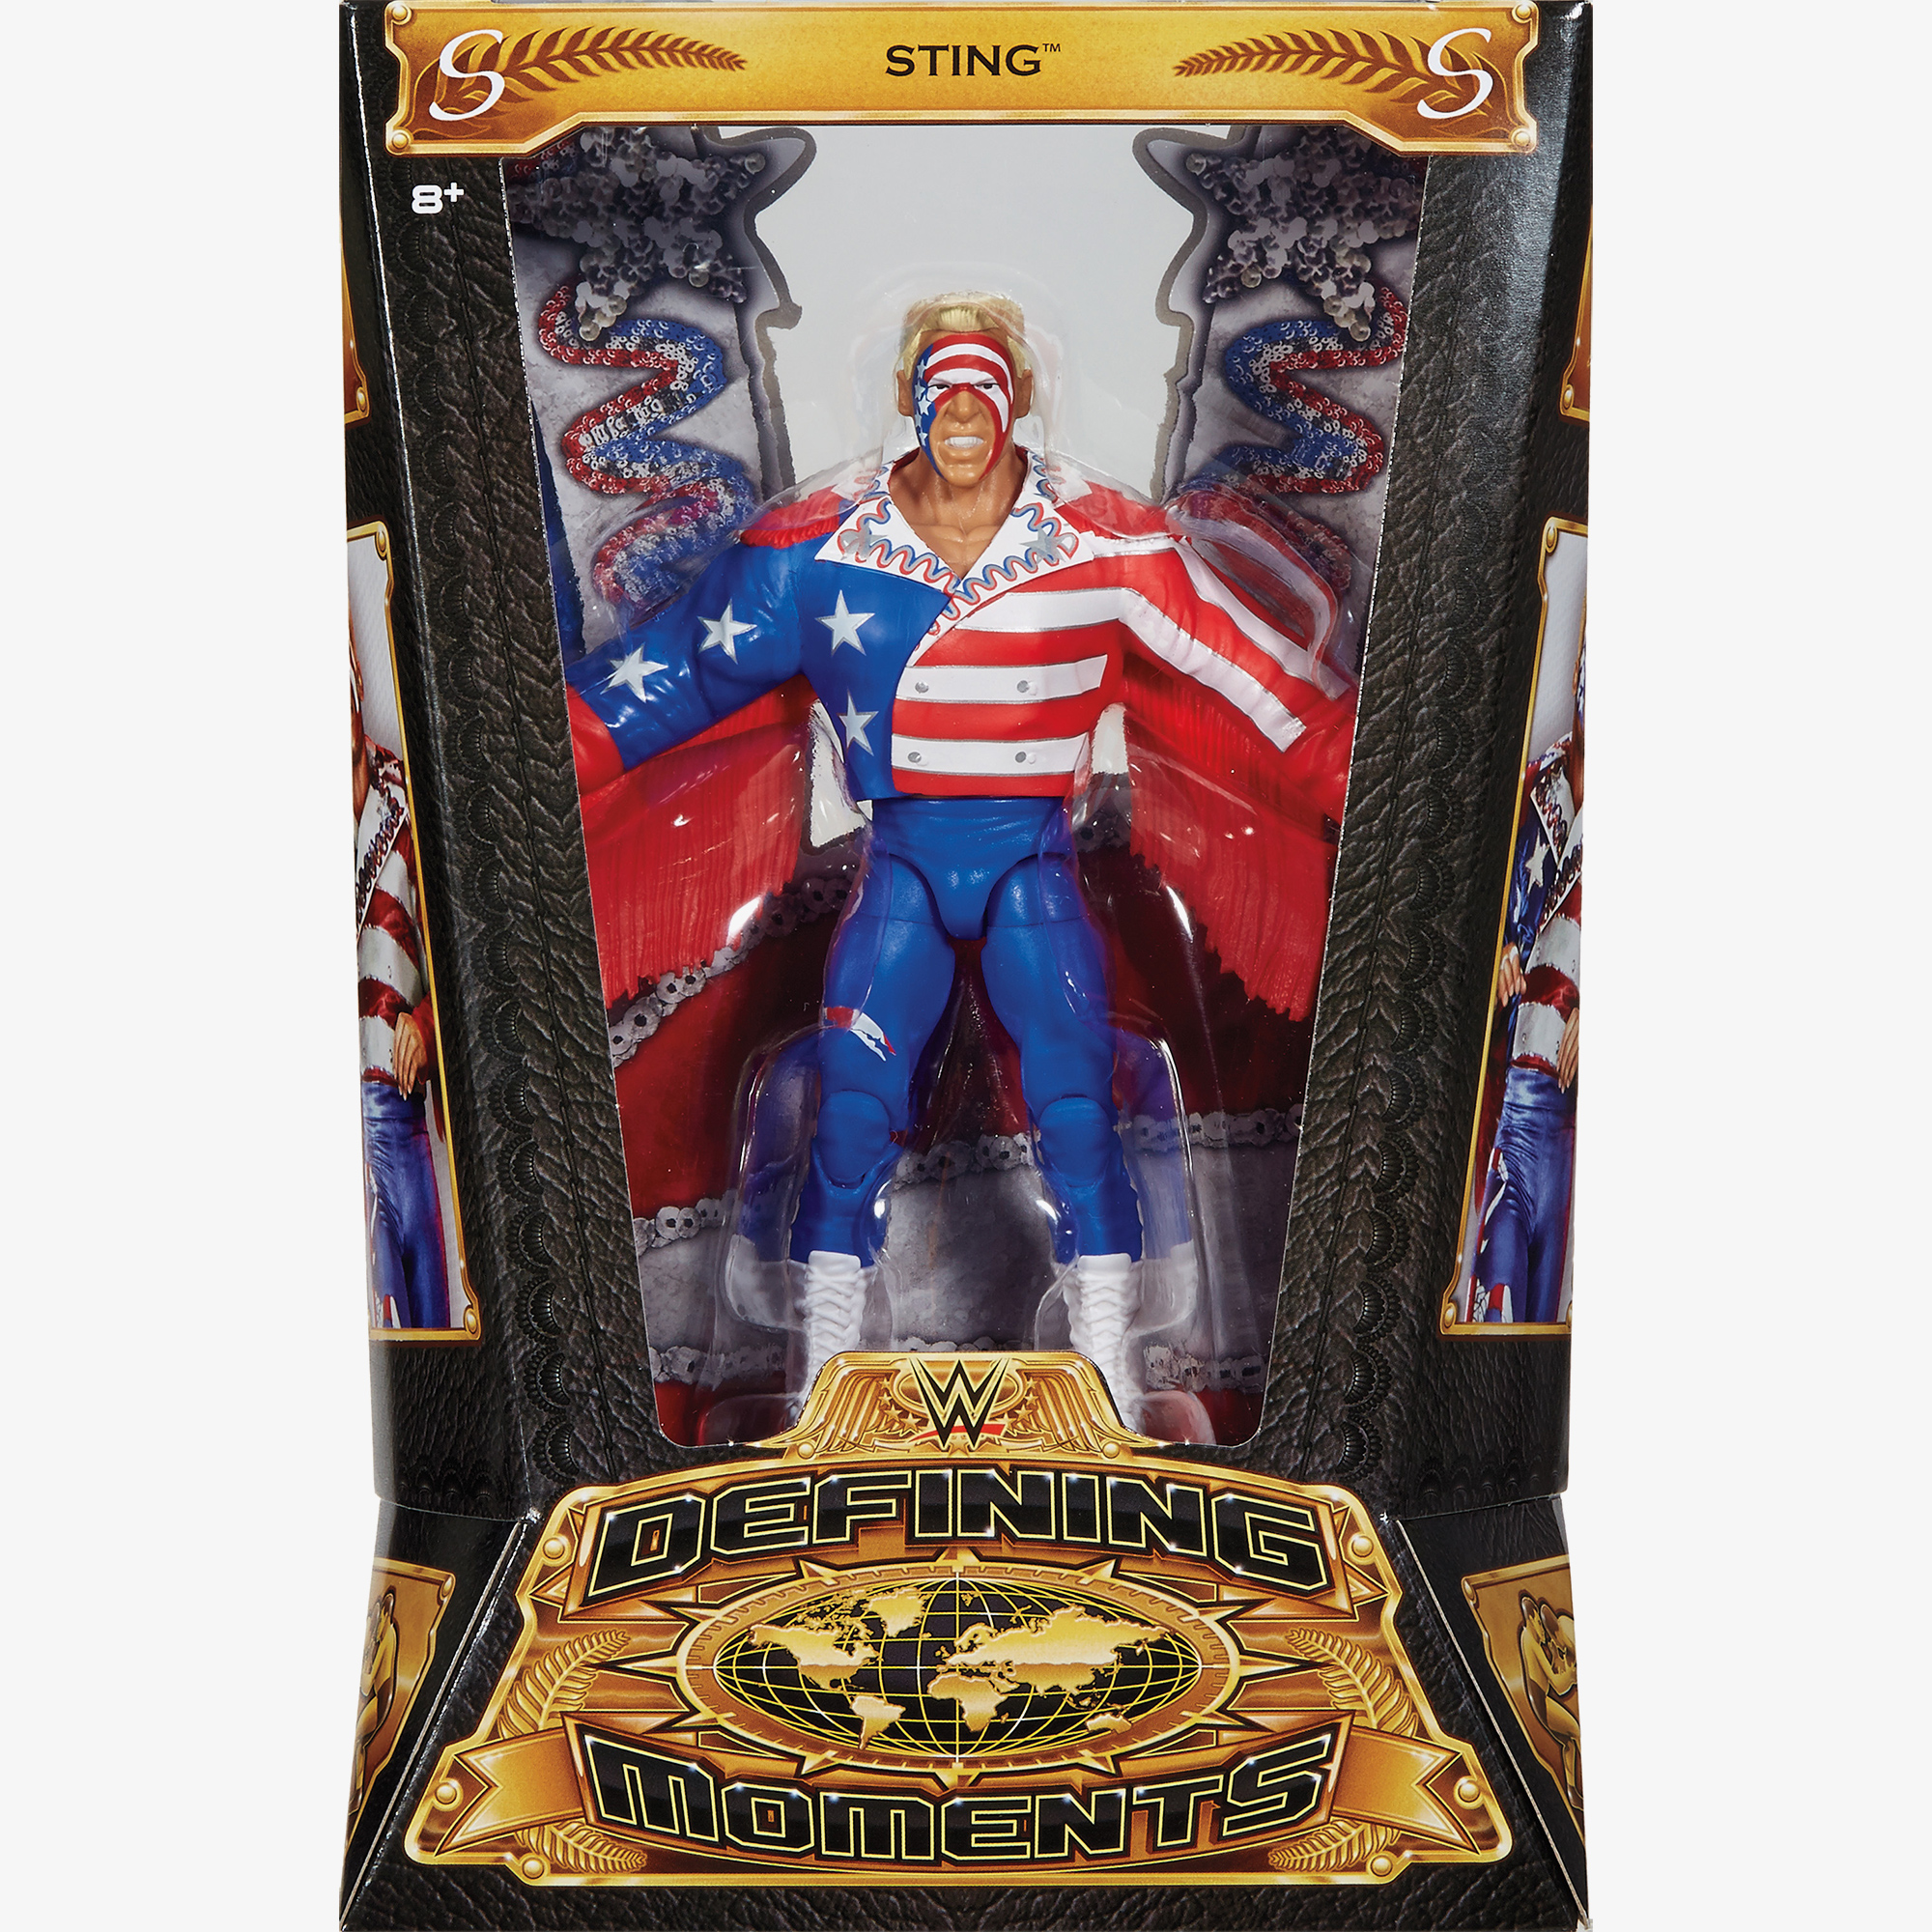 Sting/Toys | Pro Wrestling | FANDOM powered by Wikia